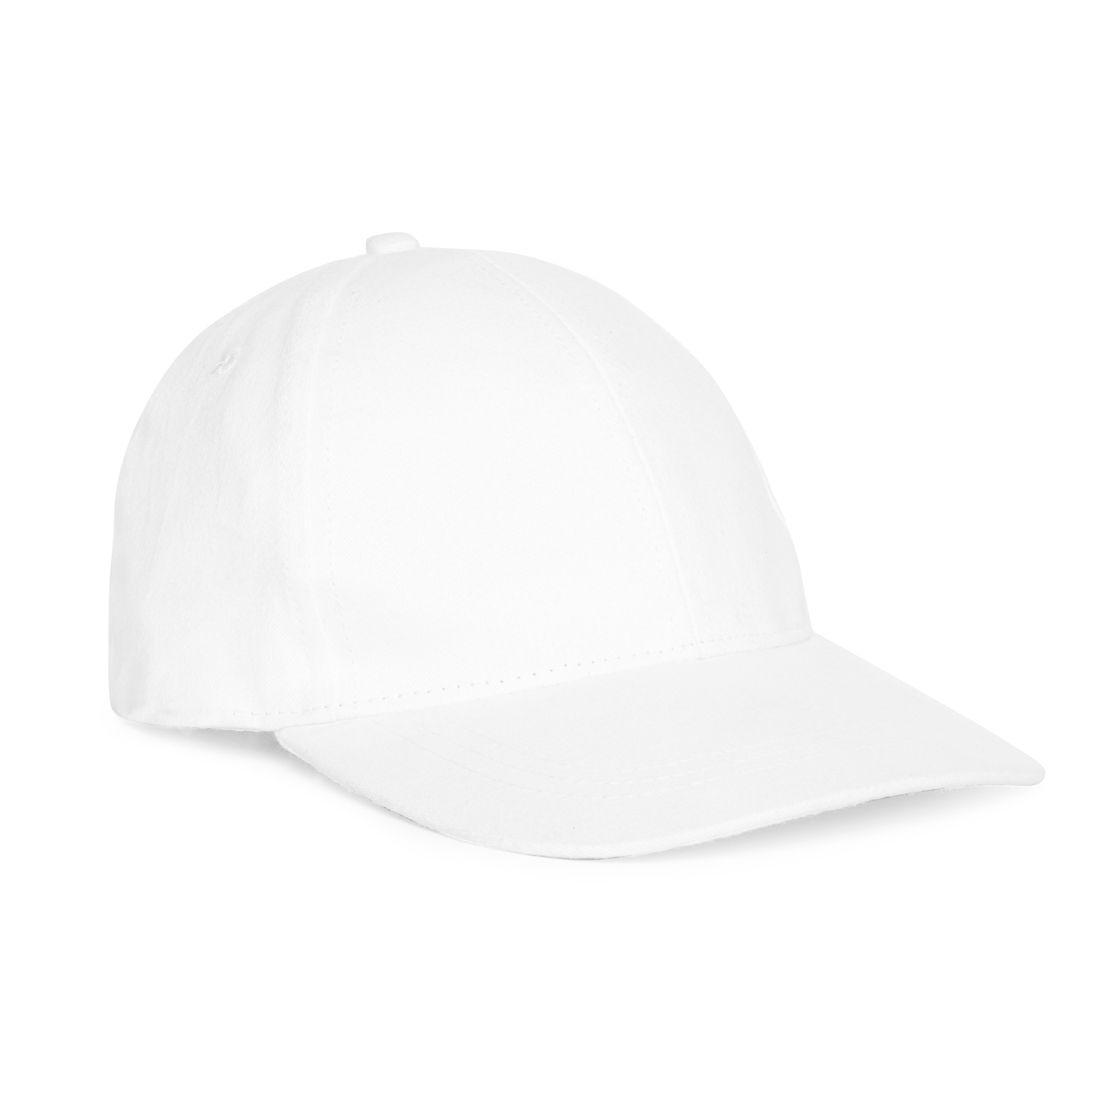 White Baseball Cap - 2€